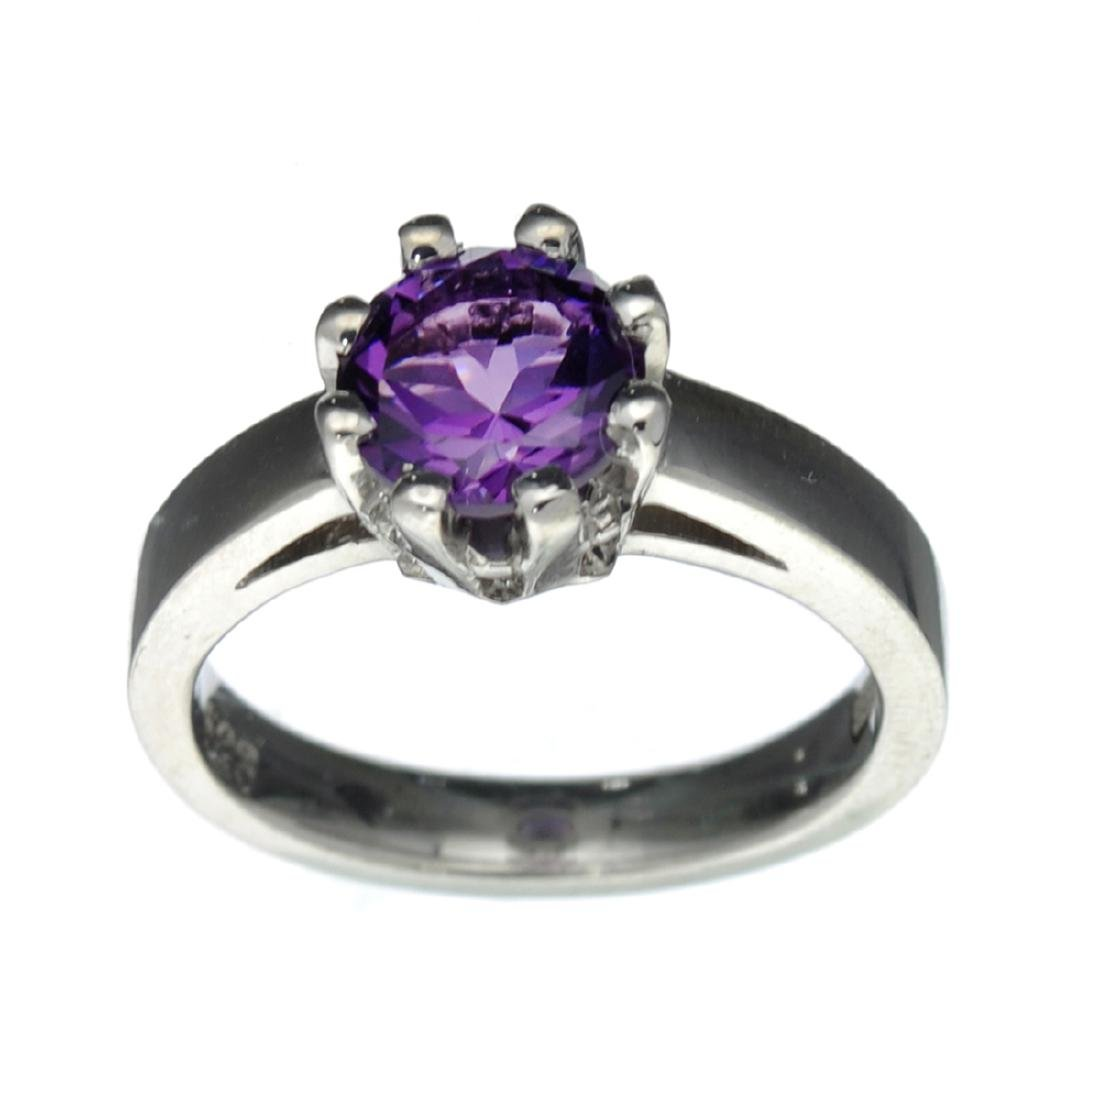 APP: 0.5k Fine Jewelry Designer Sebastian, 1.19CT Round